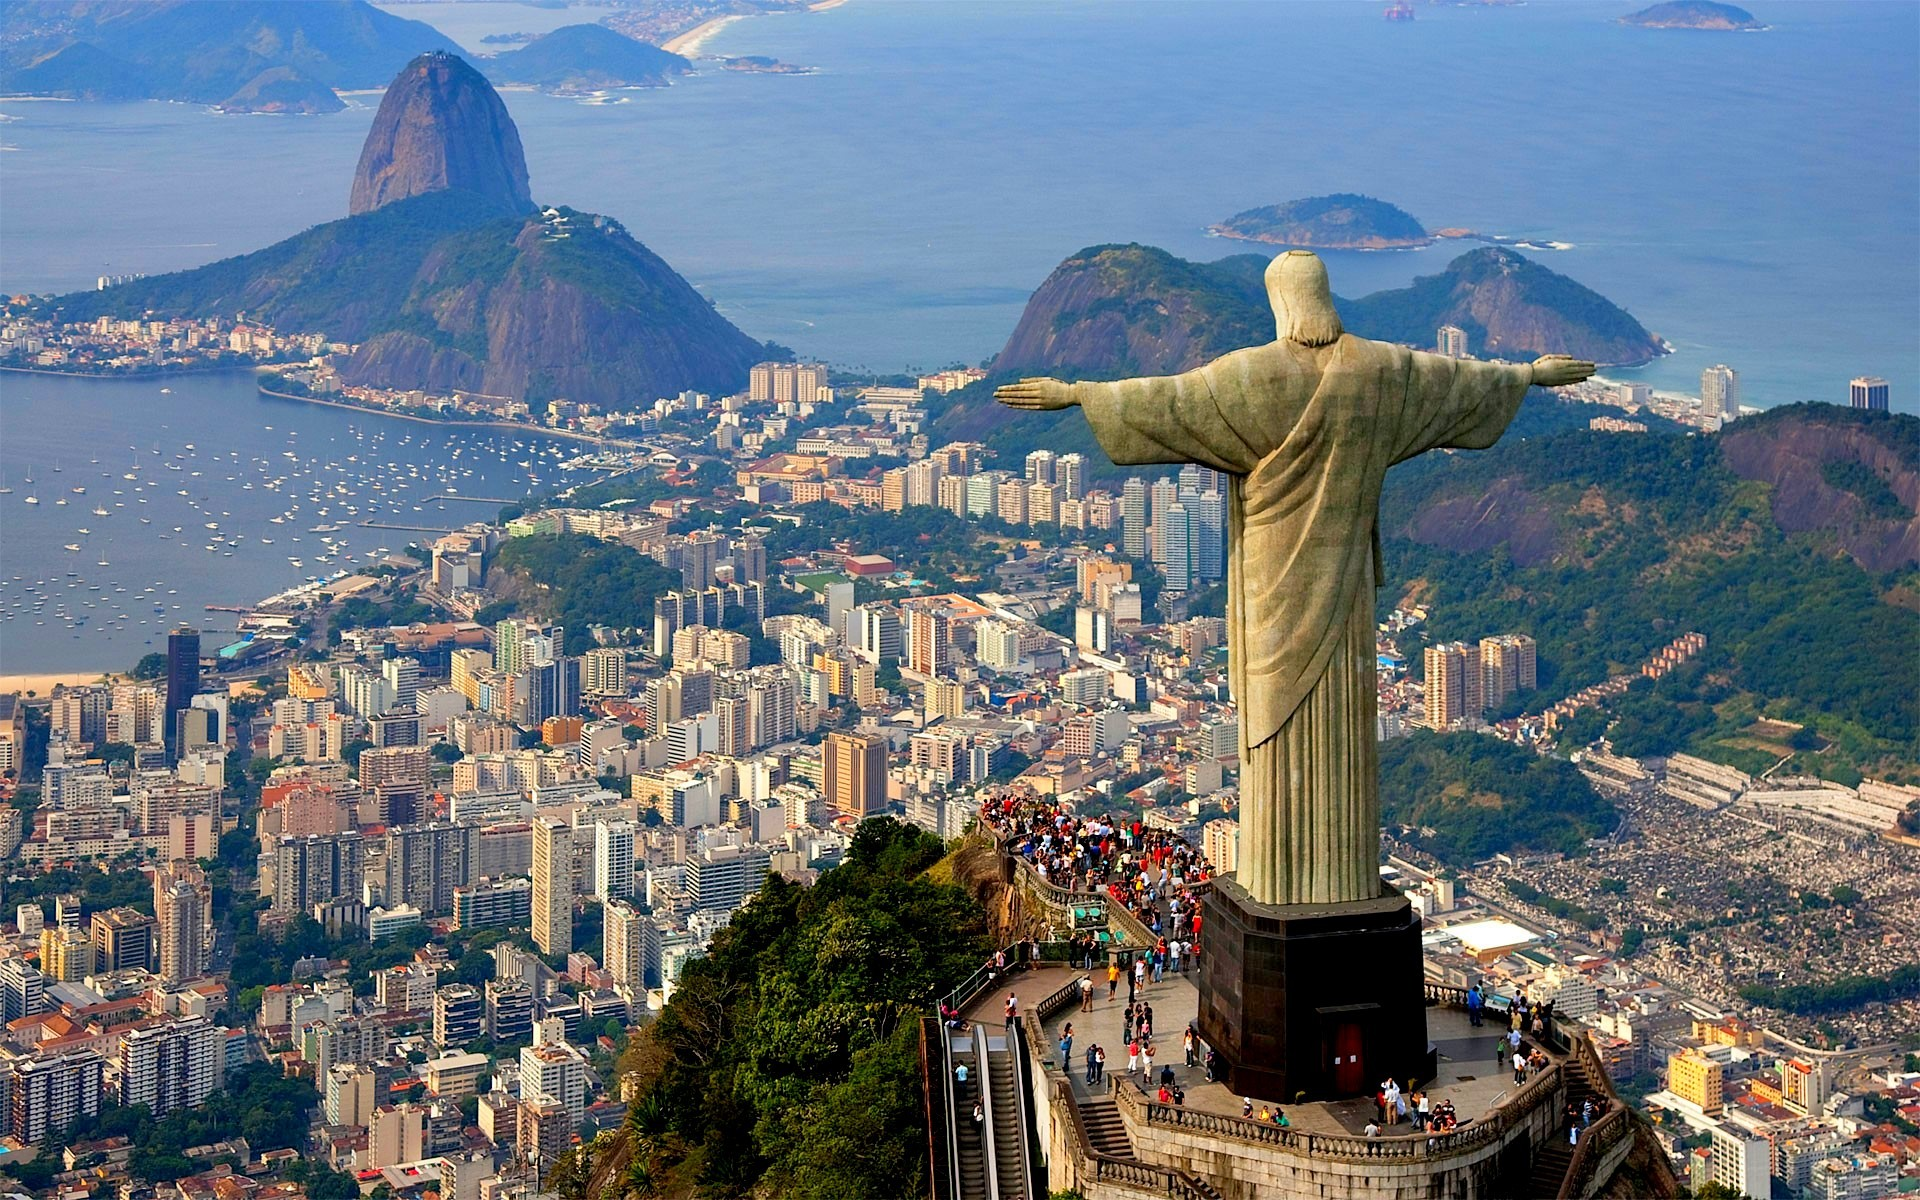 fotografias-tres-lugares-maravilhosos-dentro-continente-americano-capa-eMania-18-07